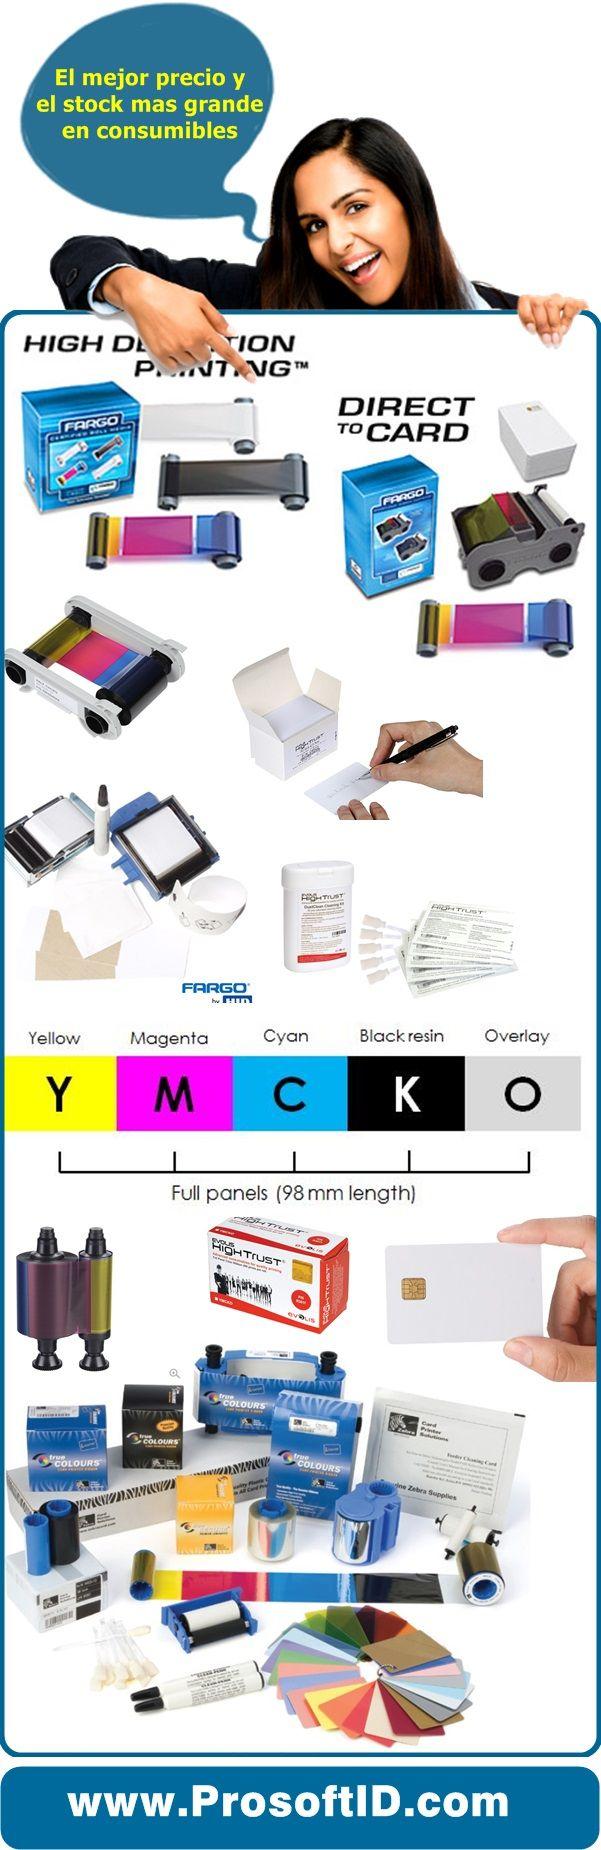 consumibles impresoras Evolis, Zebra, Magicard, Nisca, Fargo, Datacard, Smart, CIM, Tarjetas plasticas, smart card, proximidad, cintas, hologramas, toda la linea completa en http://www.prosoftid.com/#ribbons-evolis-magicard